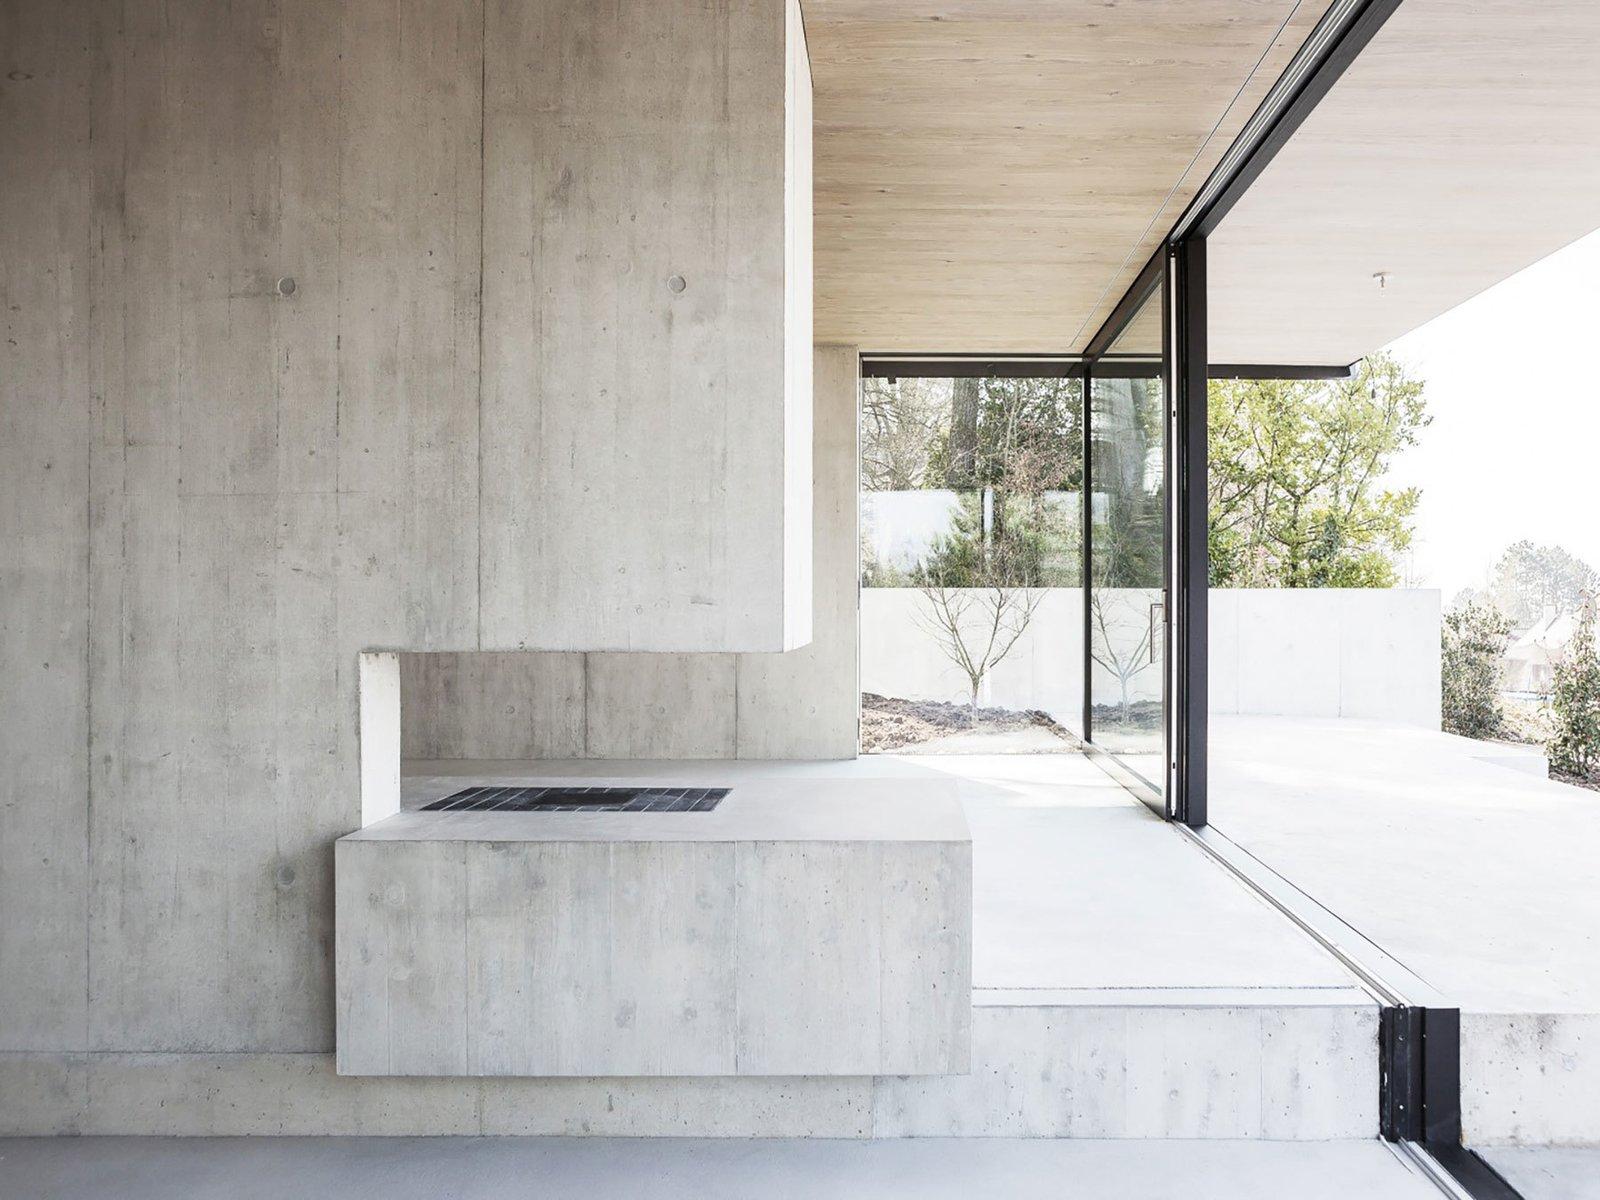 Reuter Raeber Architects